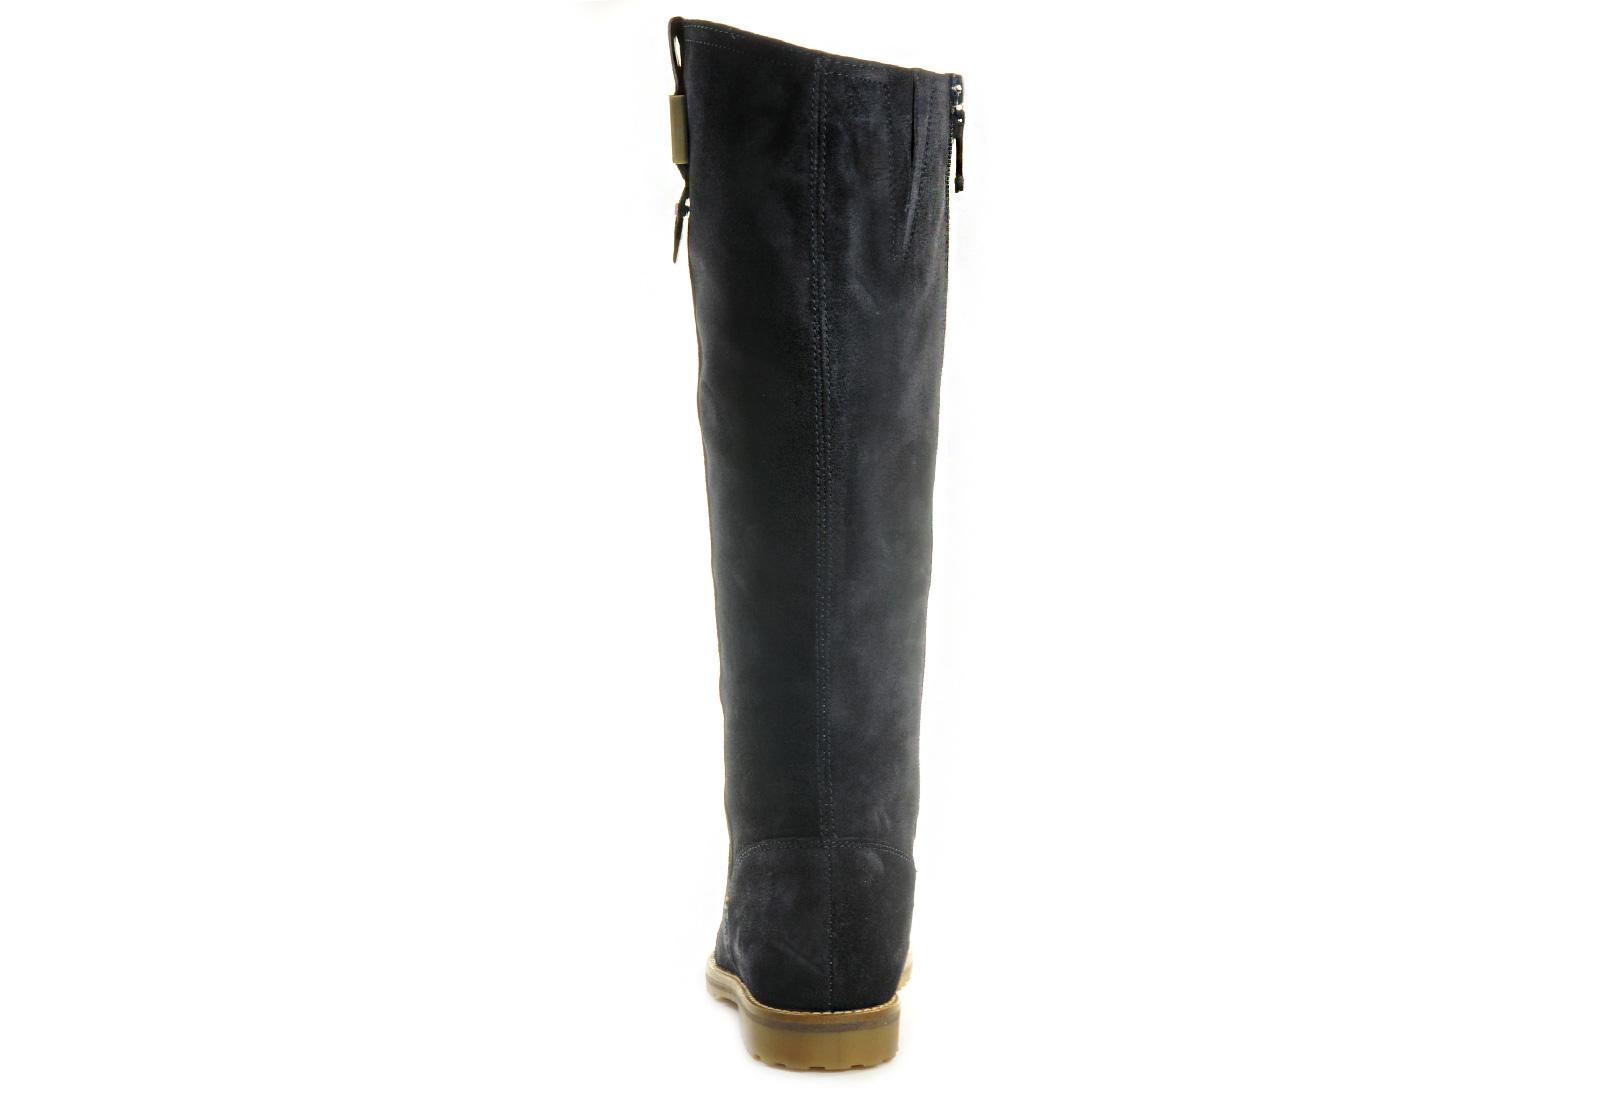 e43114e48eb14 Tommy Hilfiger Boots - Wera 15B - 13f-6058-403 - Online shop for ...